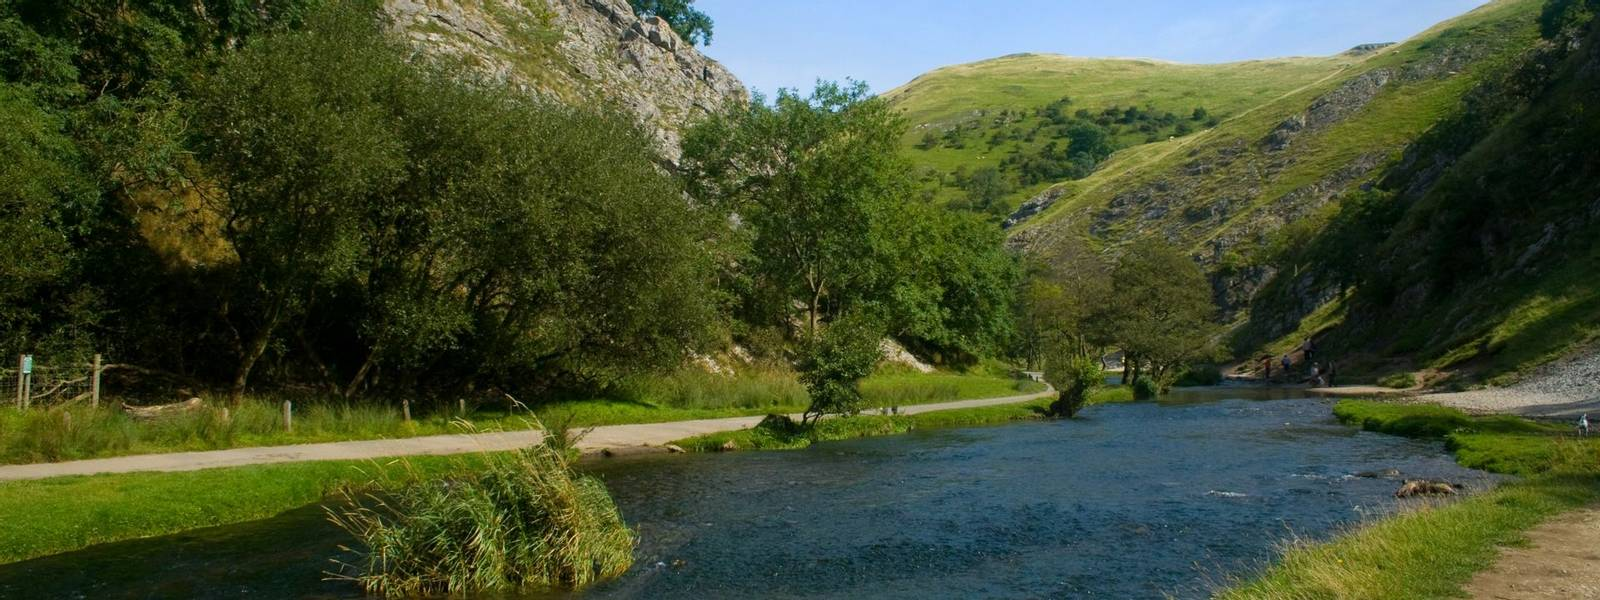 Dovedale_Gorge_Peak_District_AdobeStock_23317657.jpeg